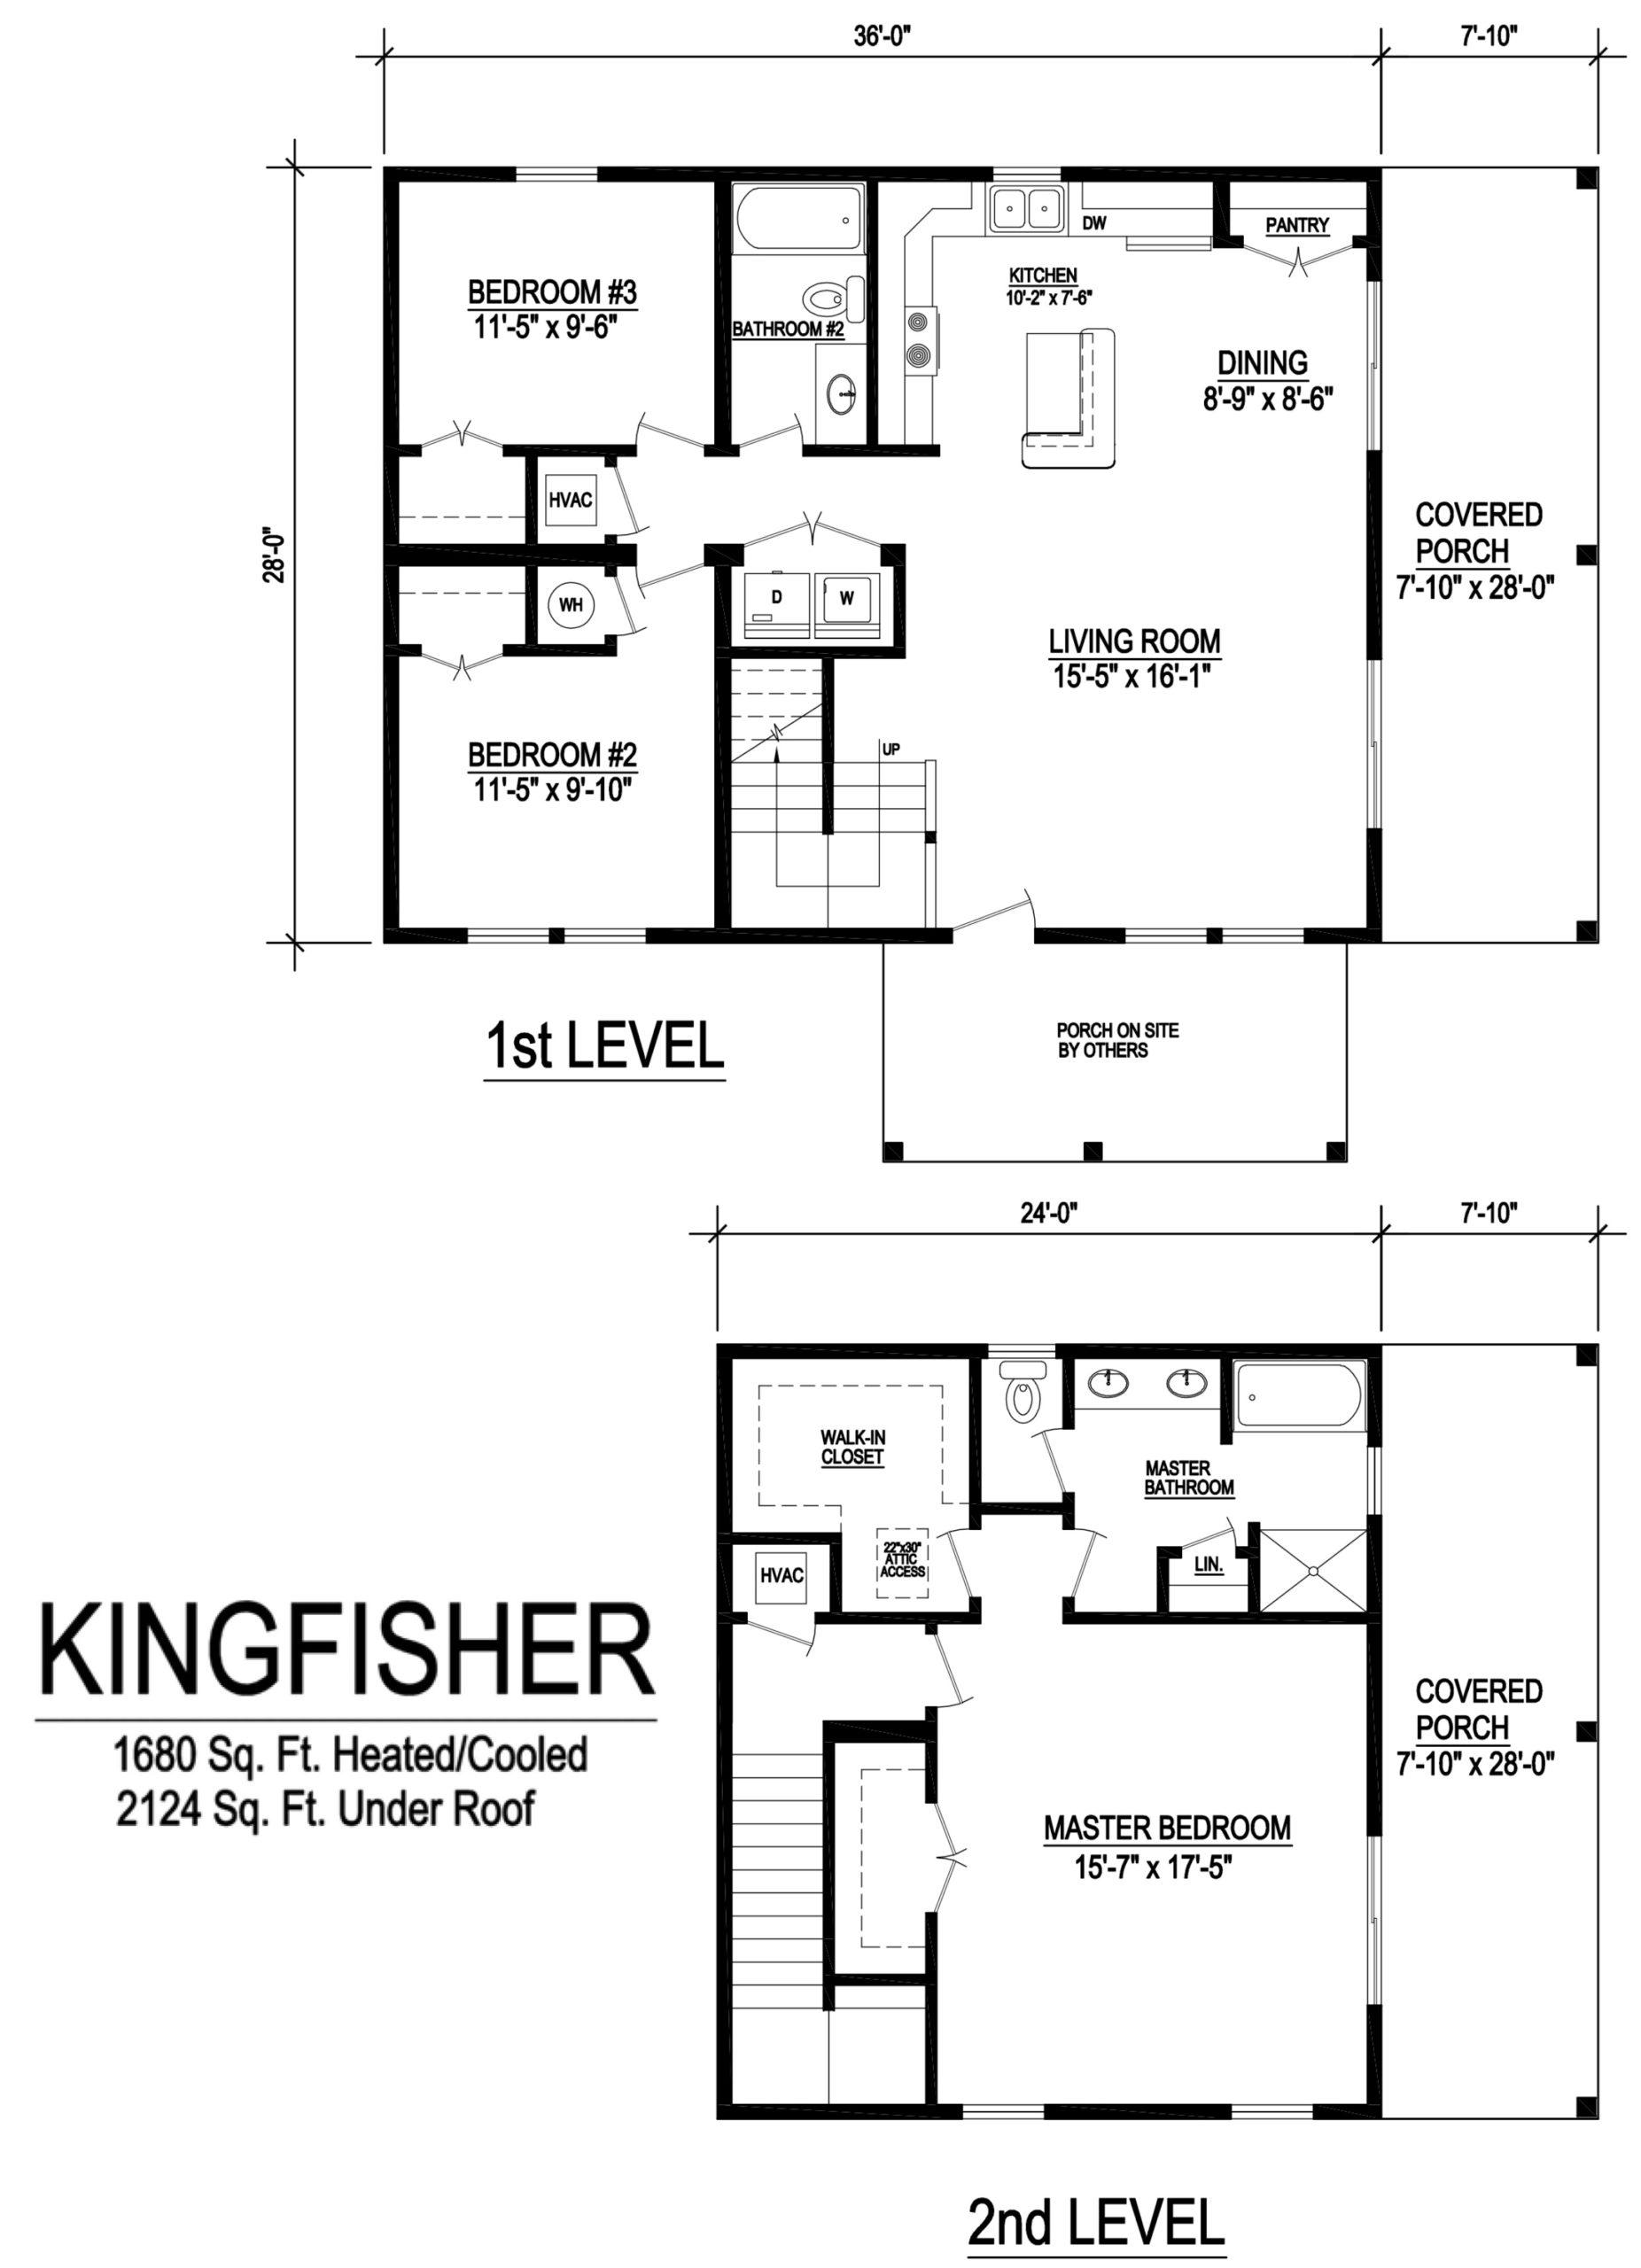 kingfisher modular home floorplan